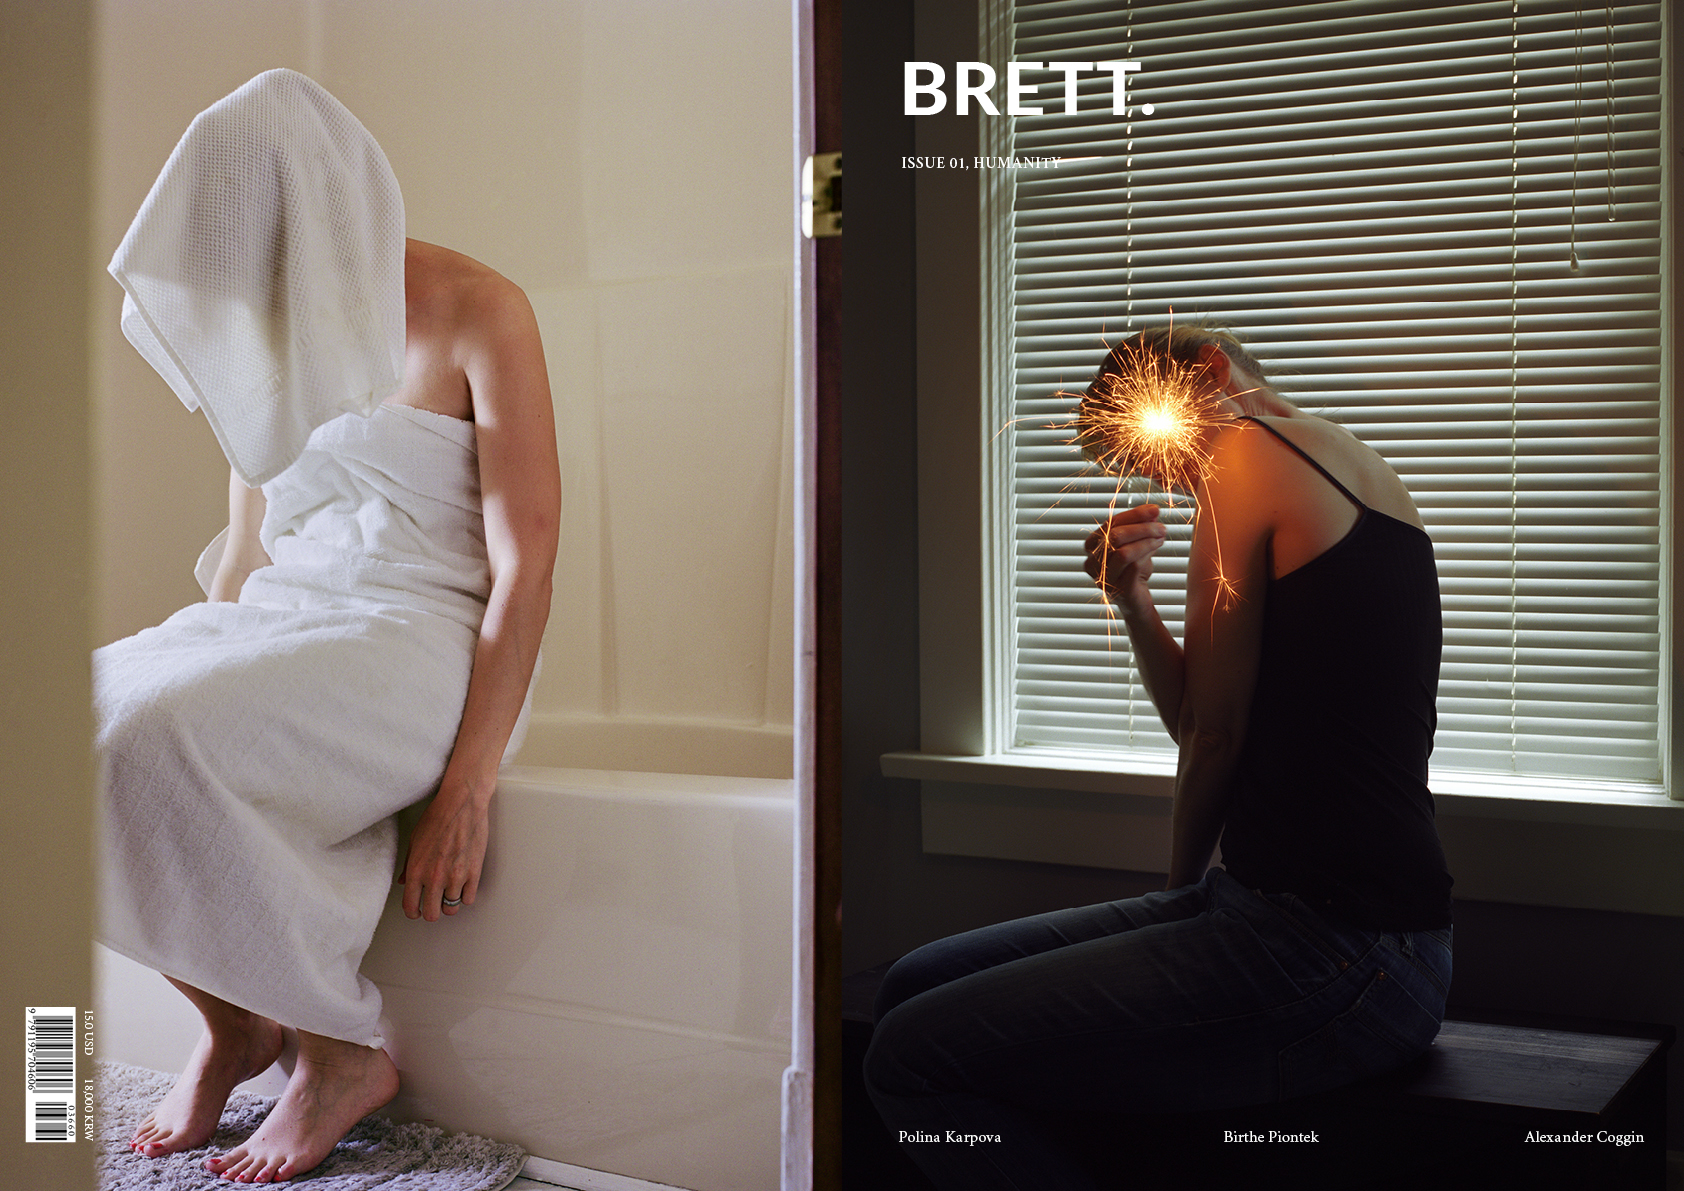 BRETT_01_coverspread.jpg